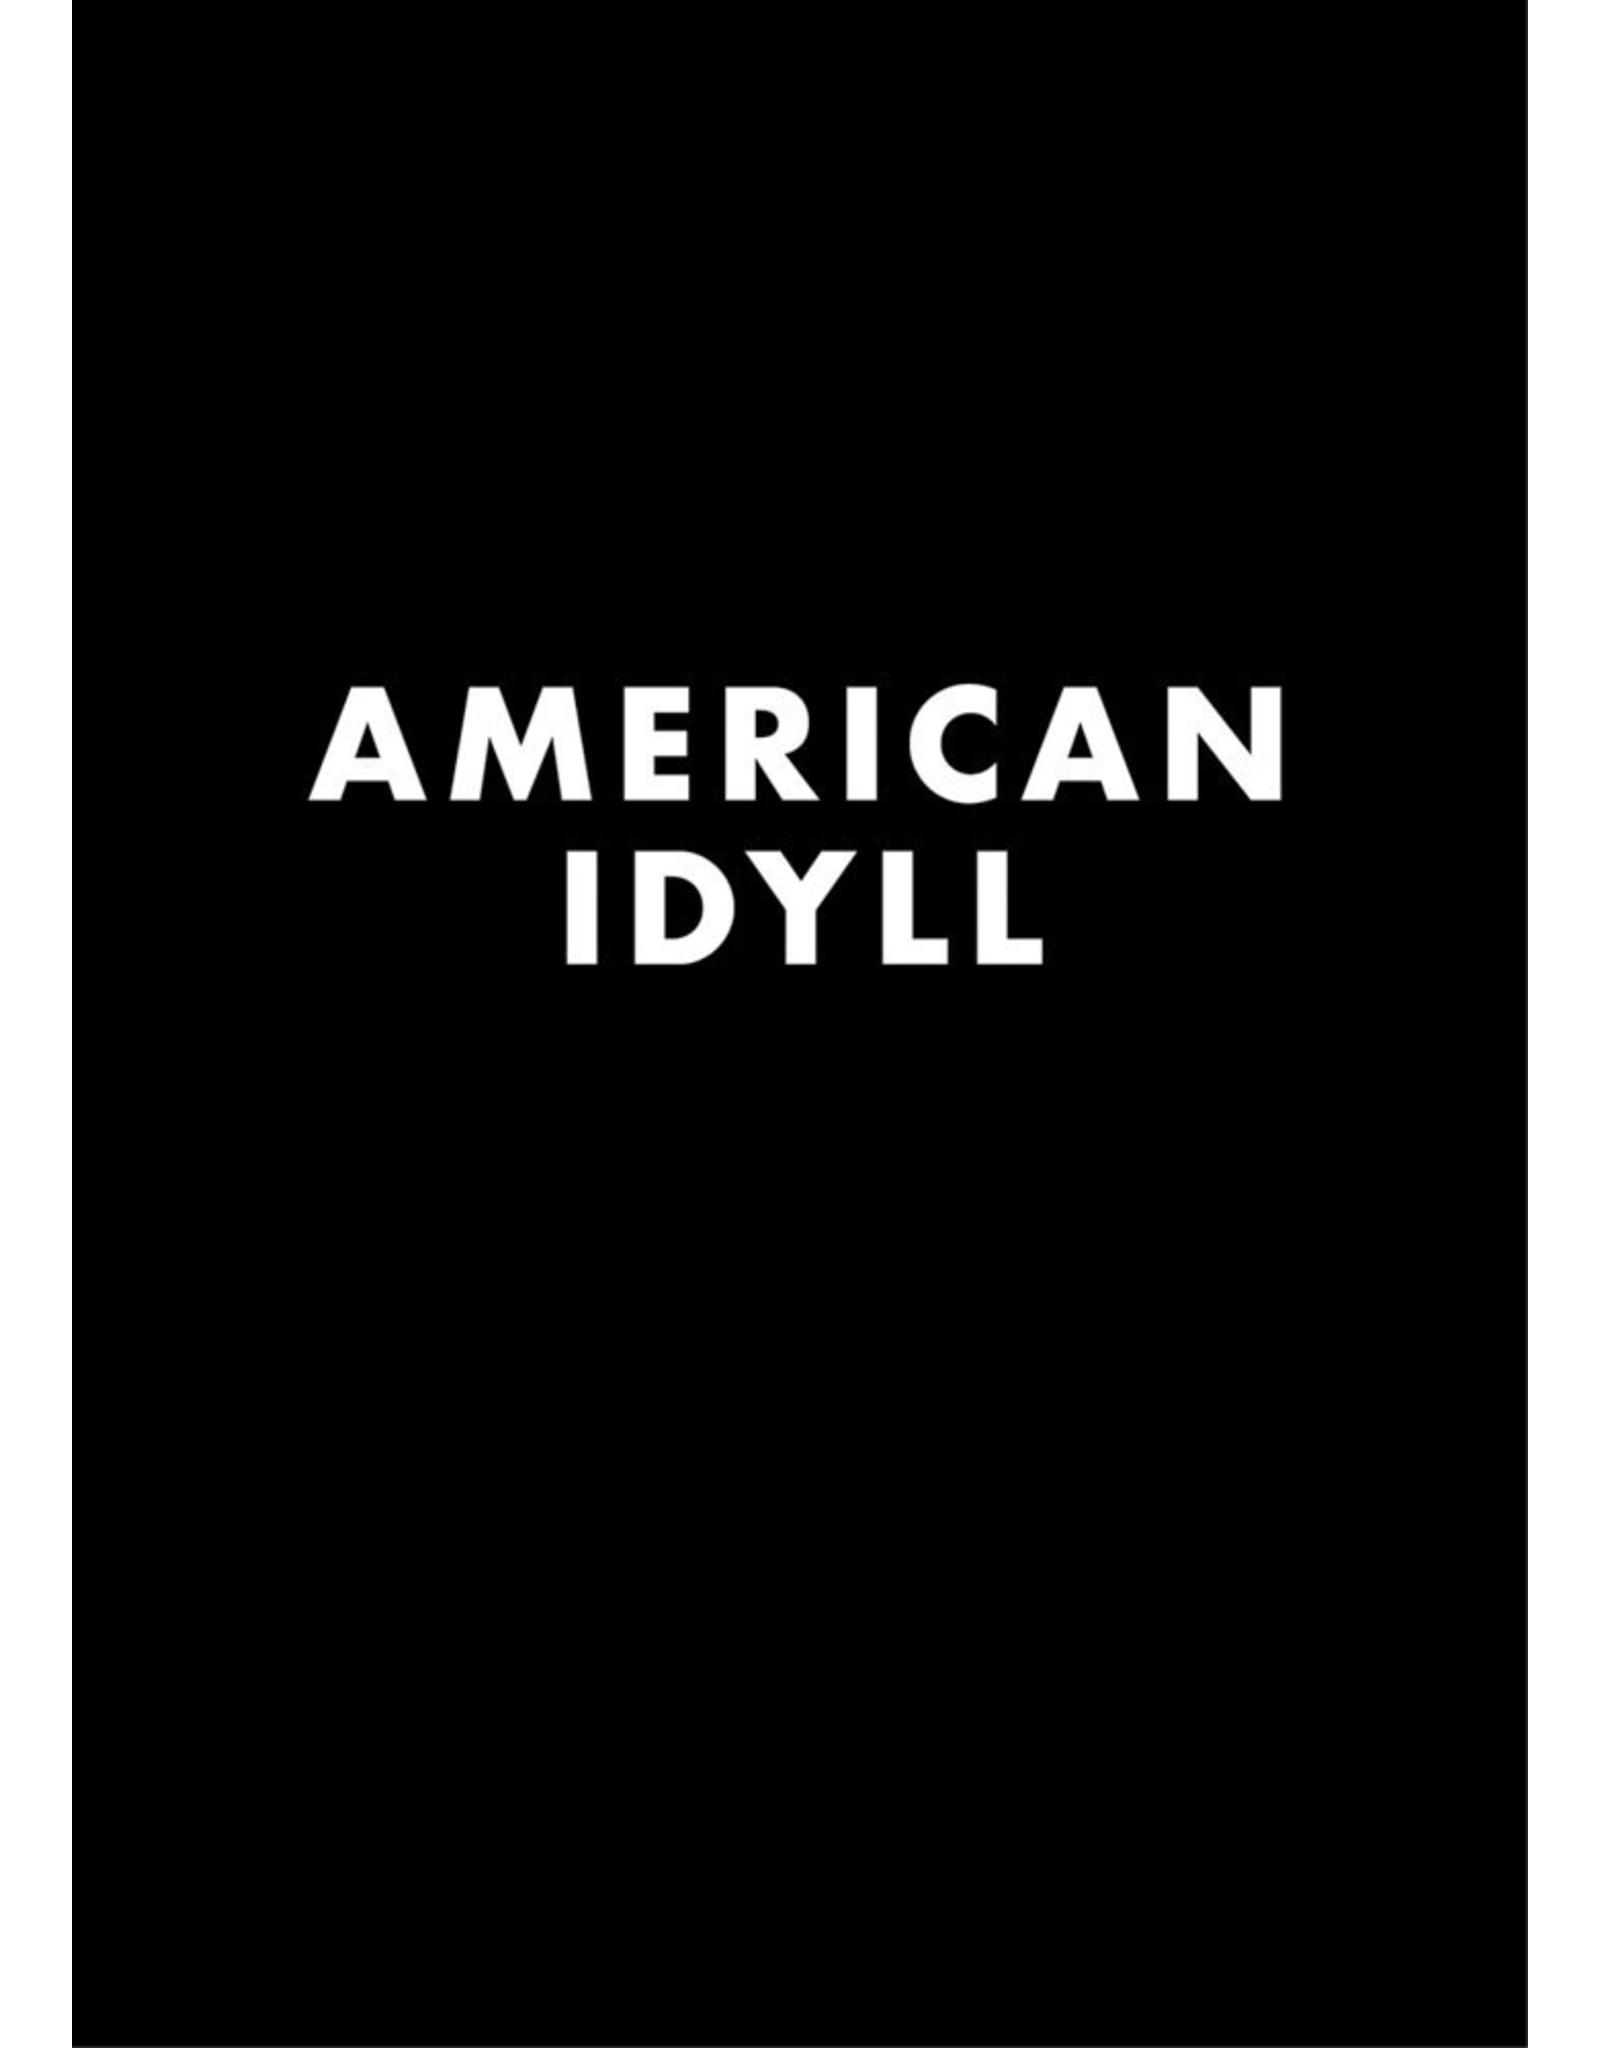 Todd R. Darling: American Idyll